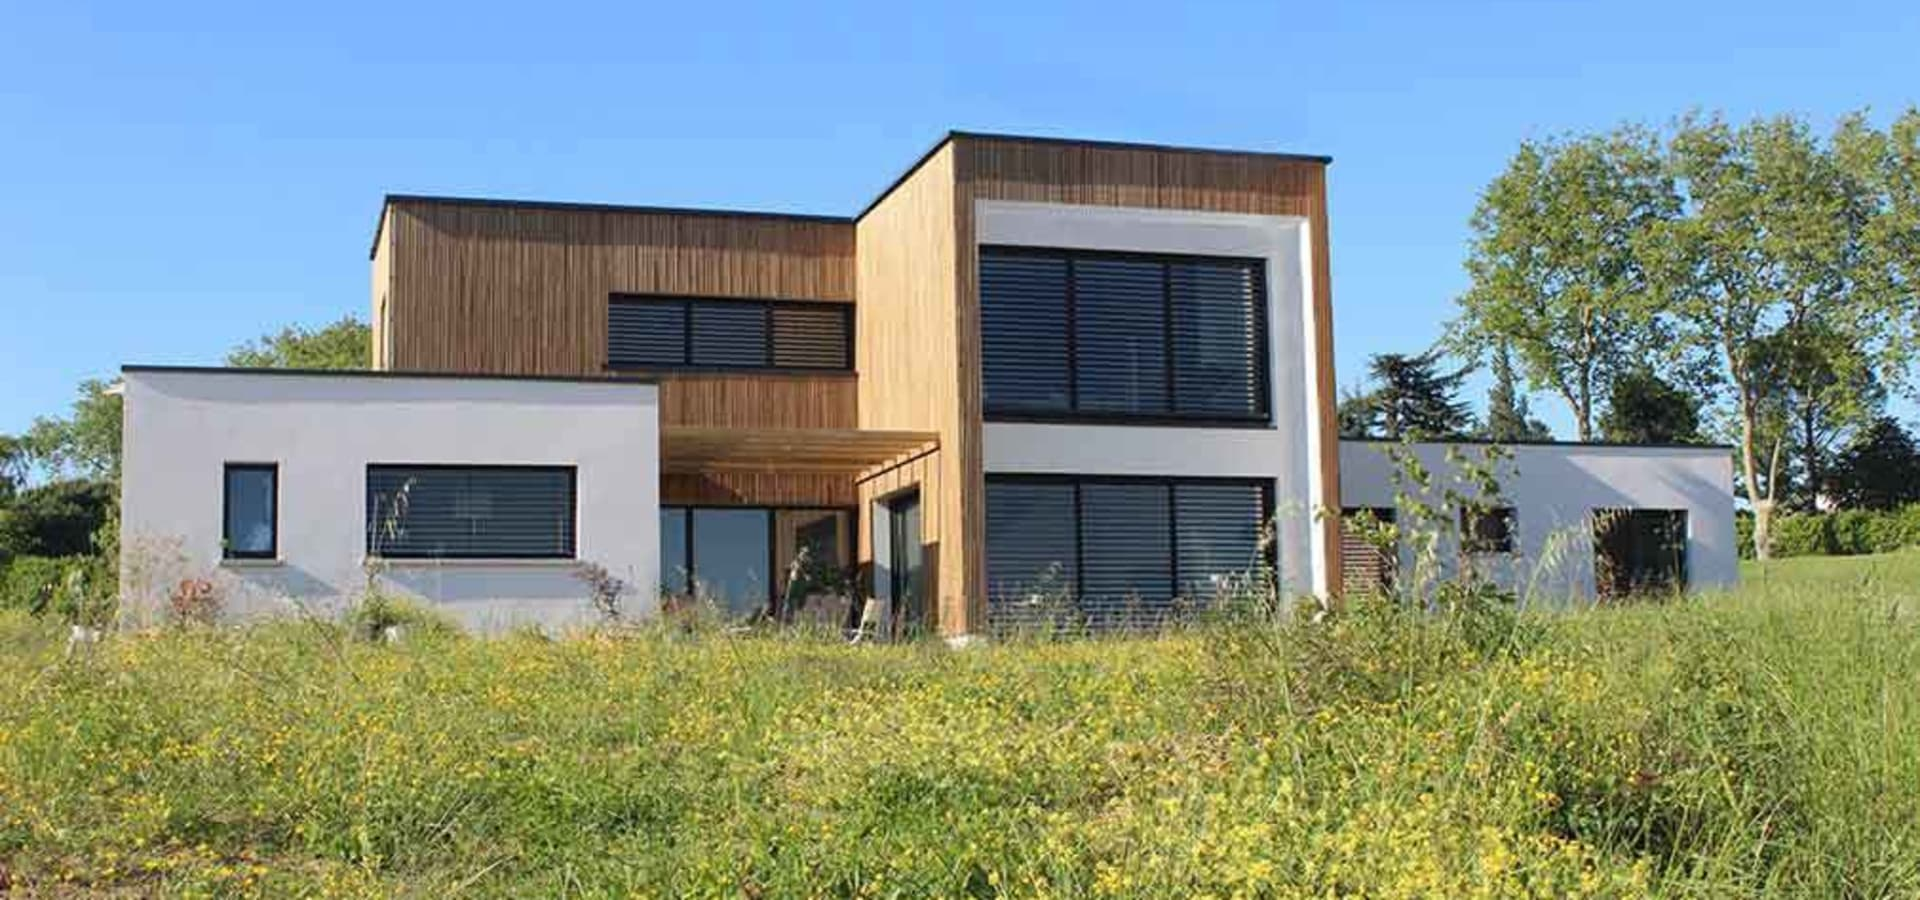 maison individuelle bbc toit terrasse v g talis by. Black Bedroom Furniture Sets. Home Design Ideas